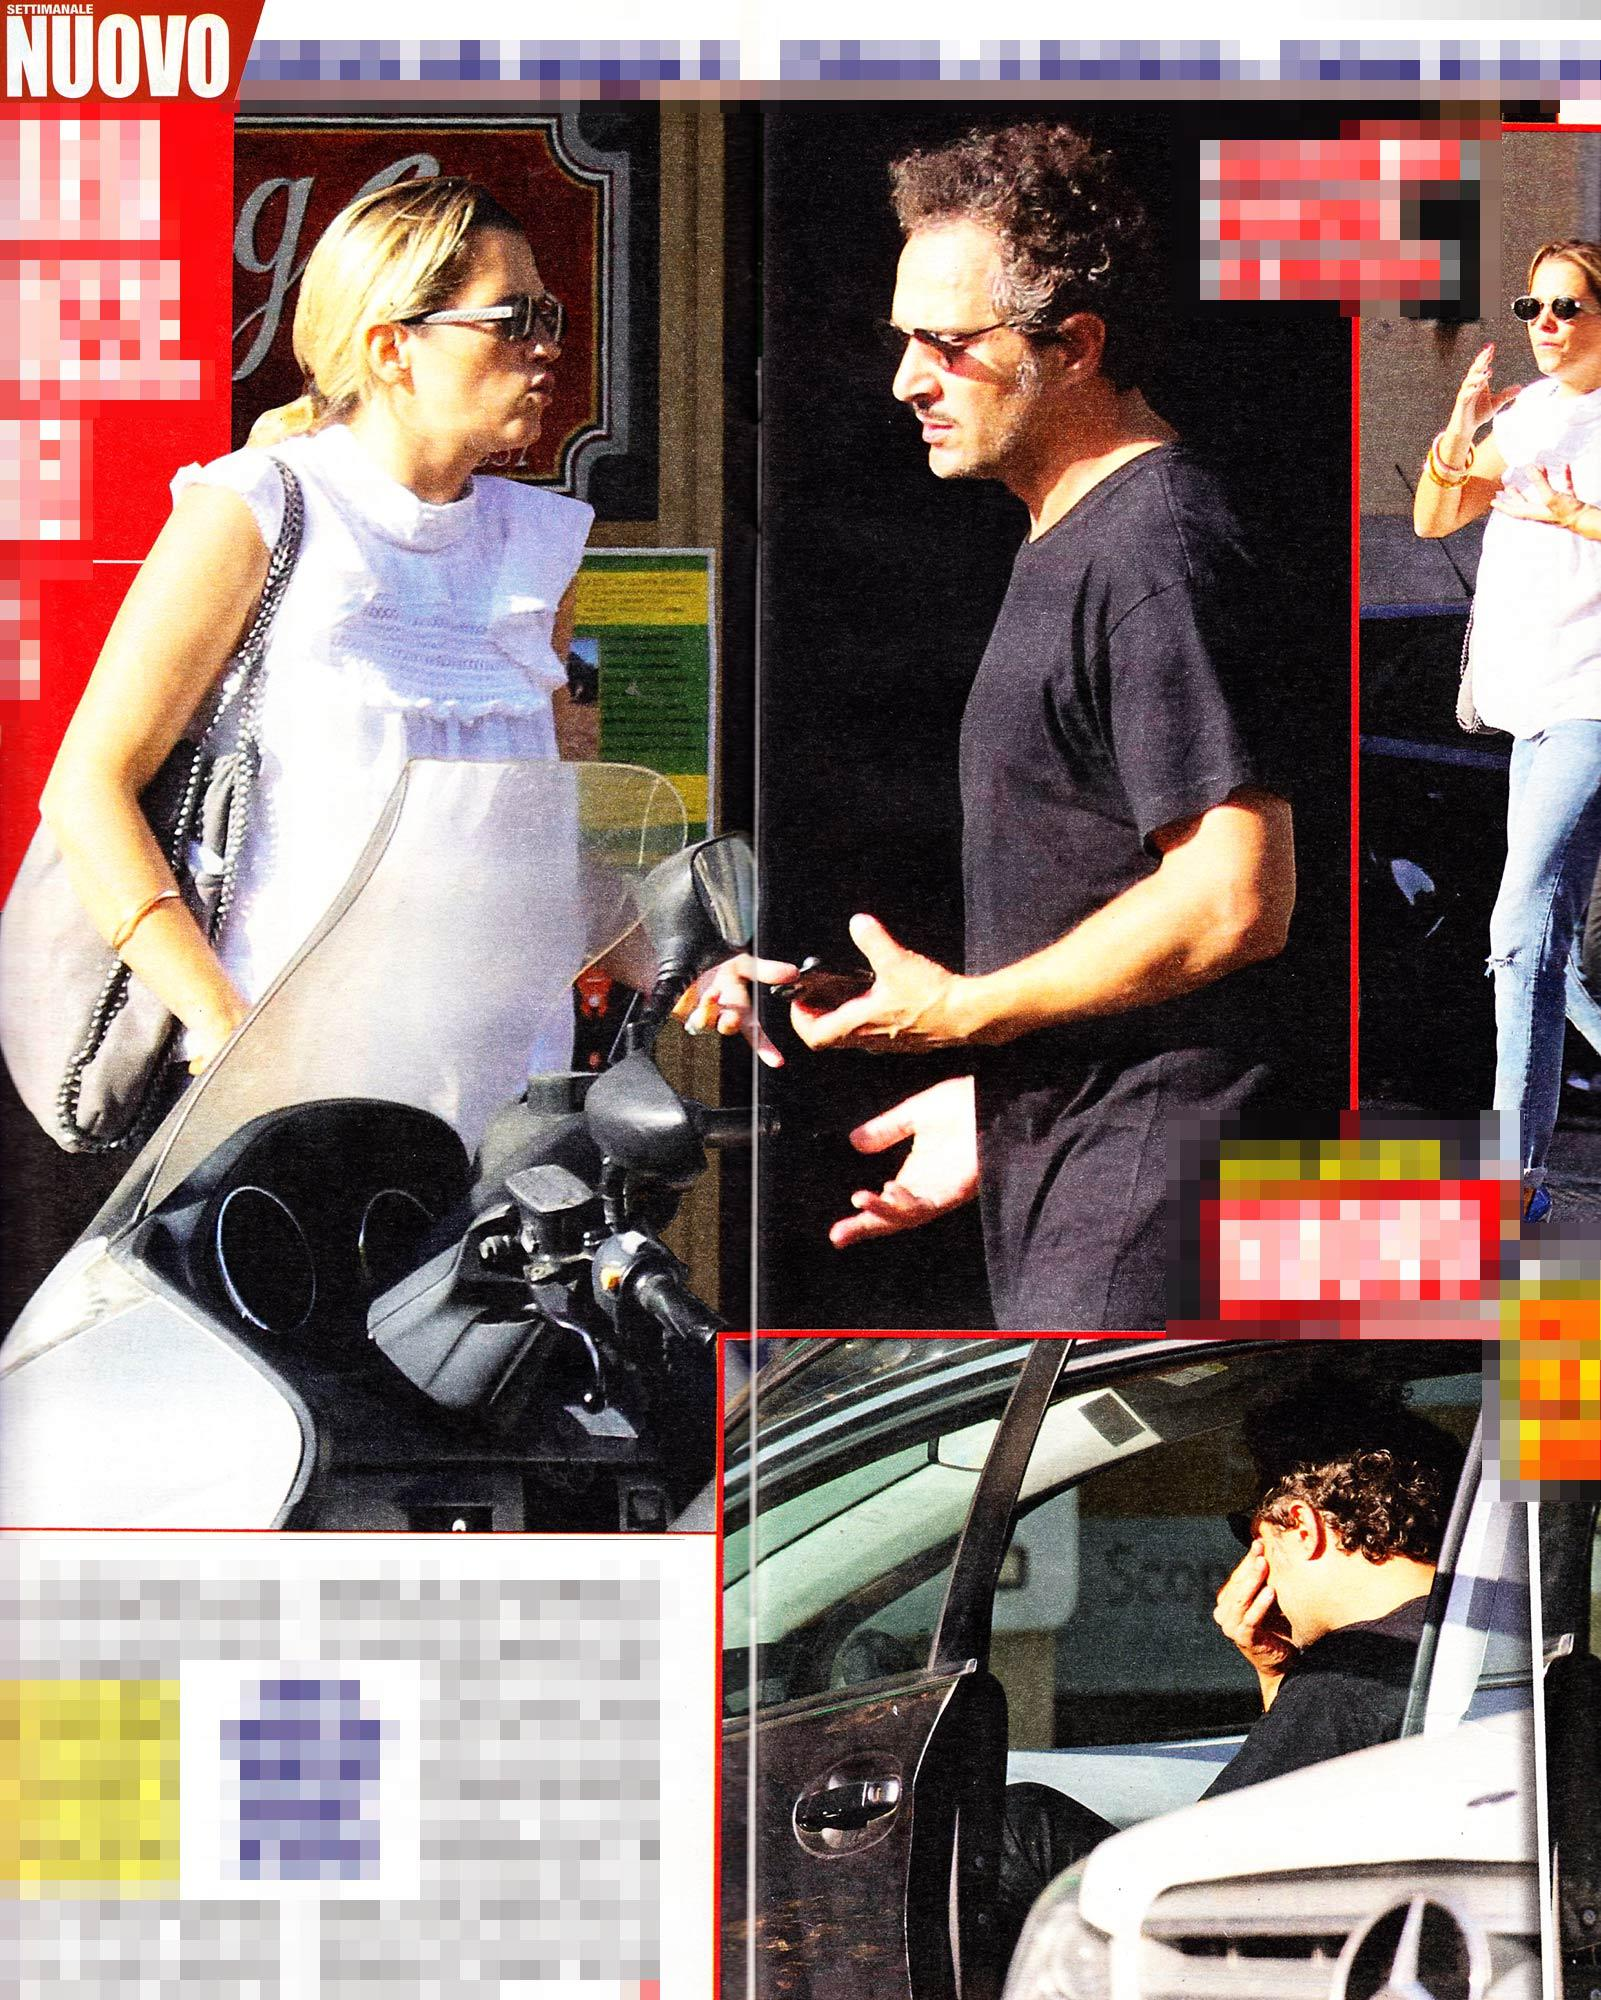 Francesca Barra e Claudio Santamaria, lite in strada con lacrime